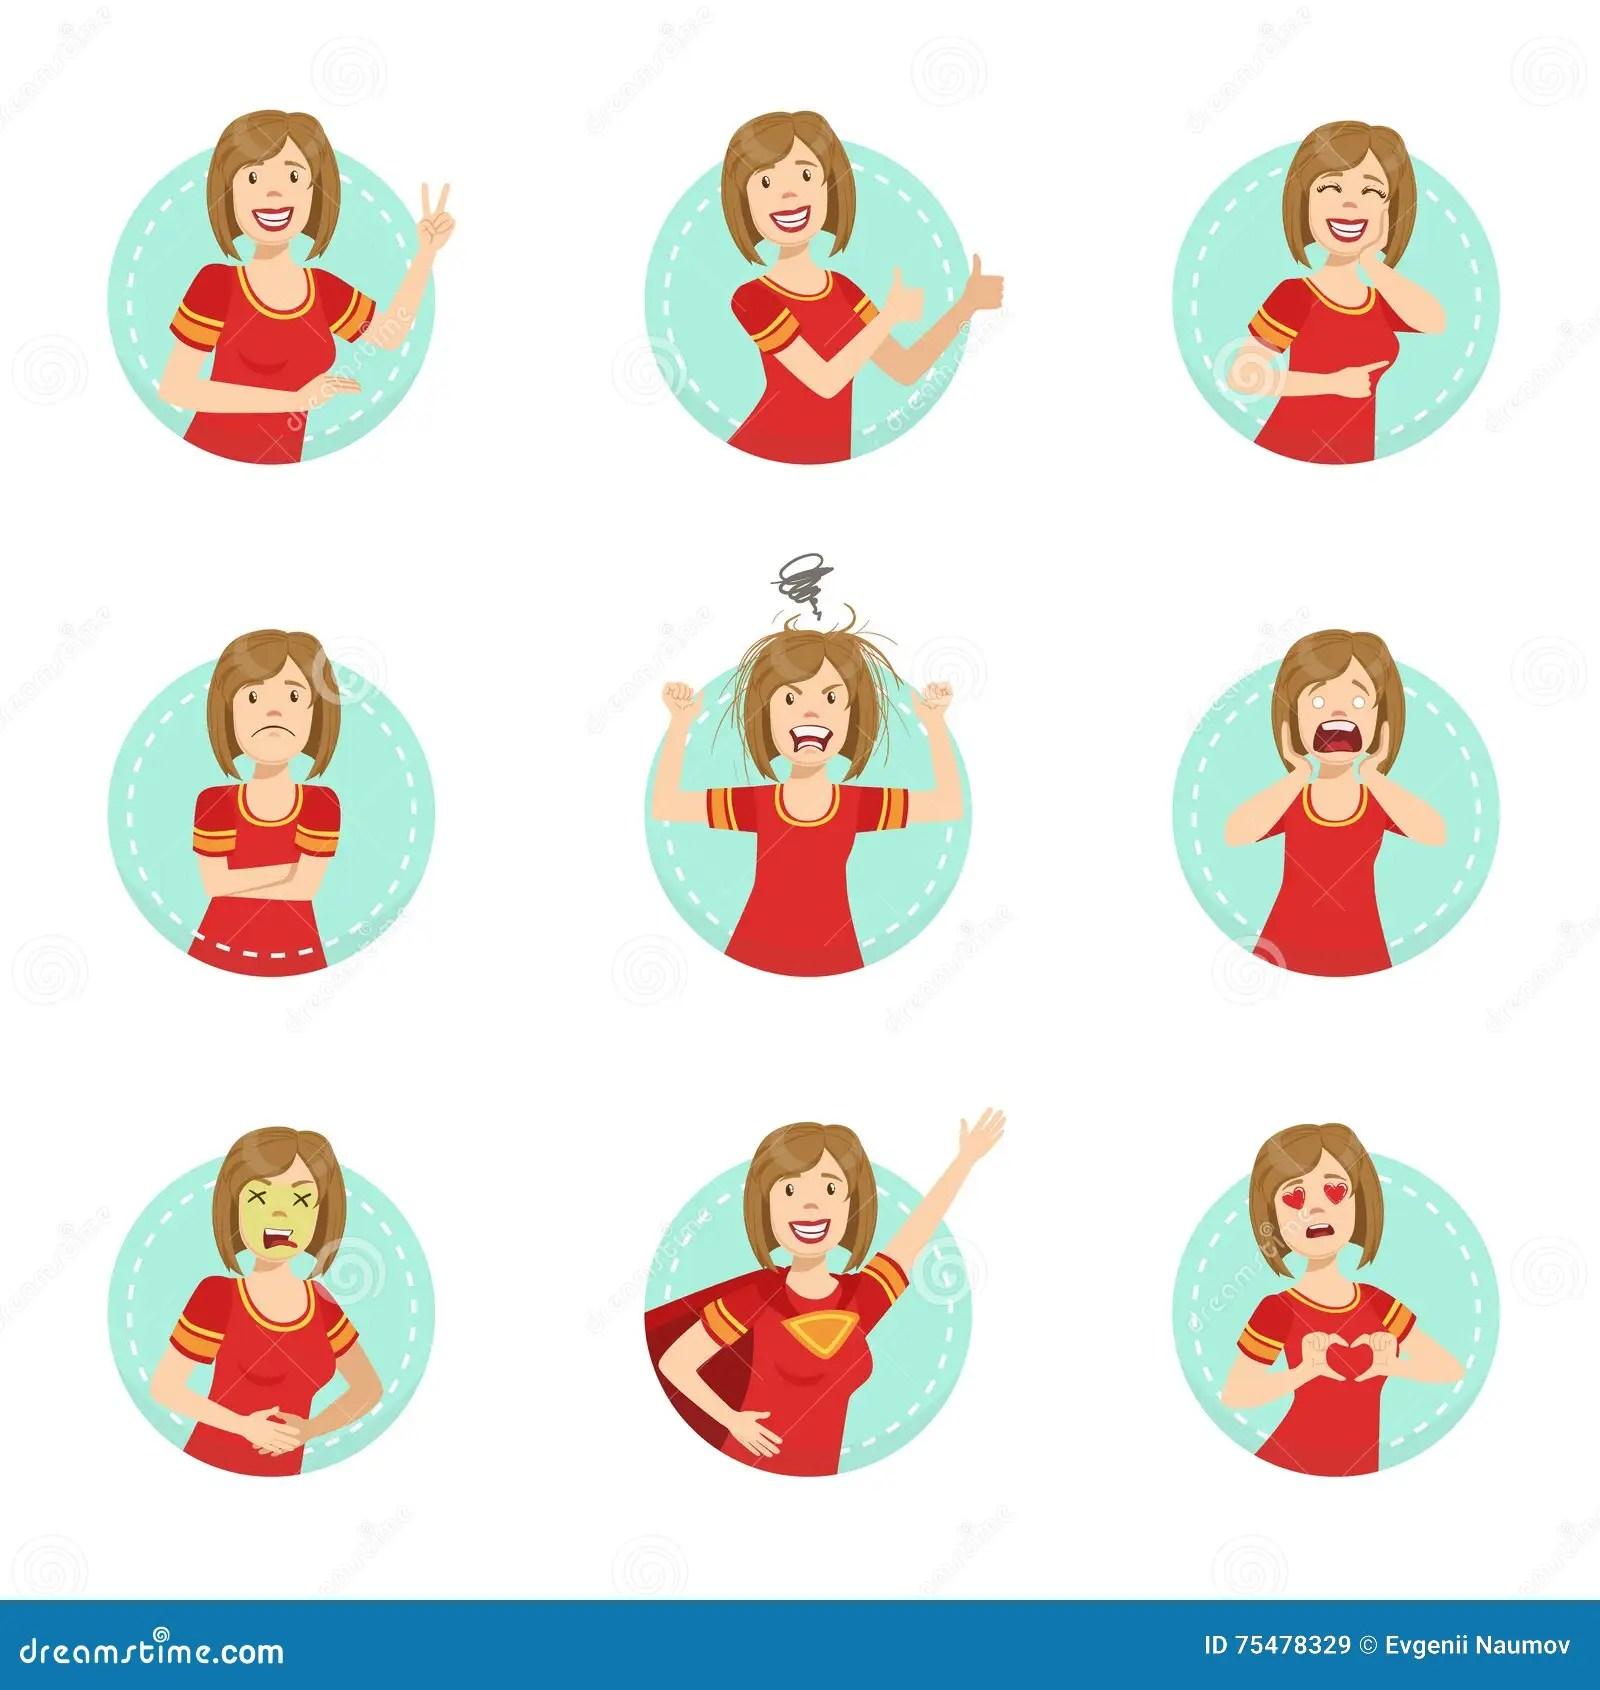 Emotion Body Language Illustration Set With Woman